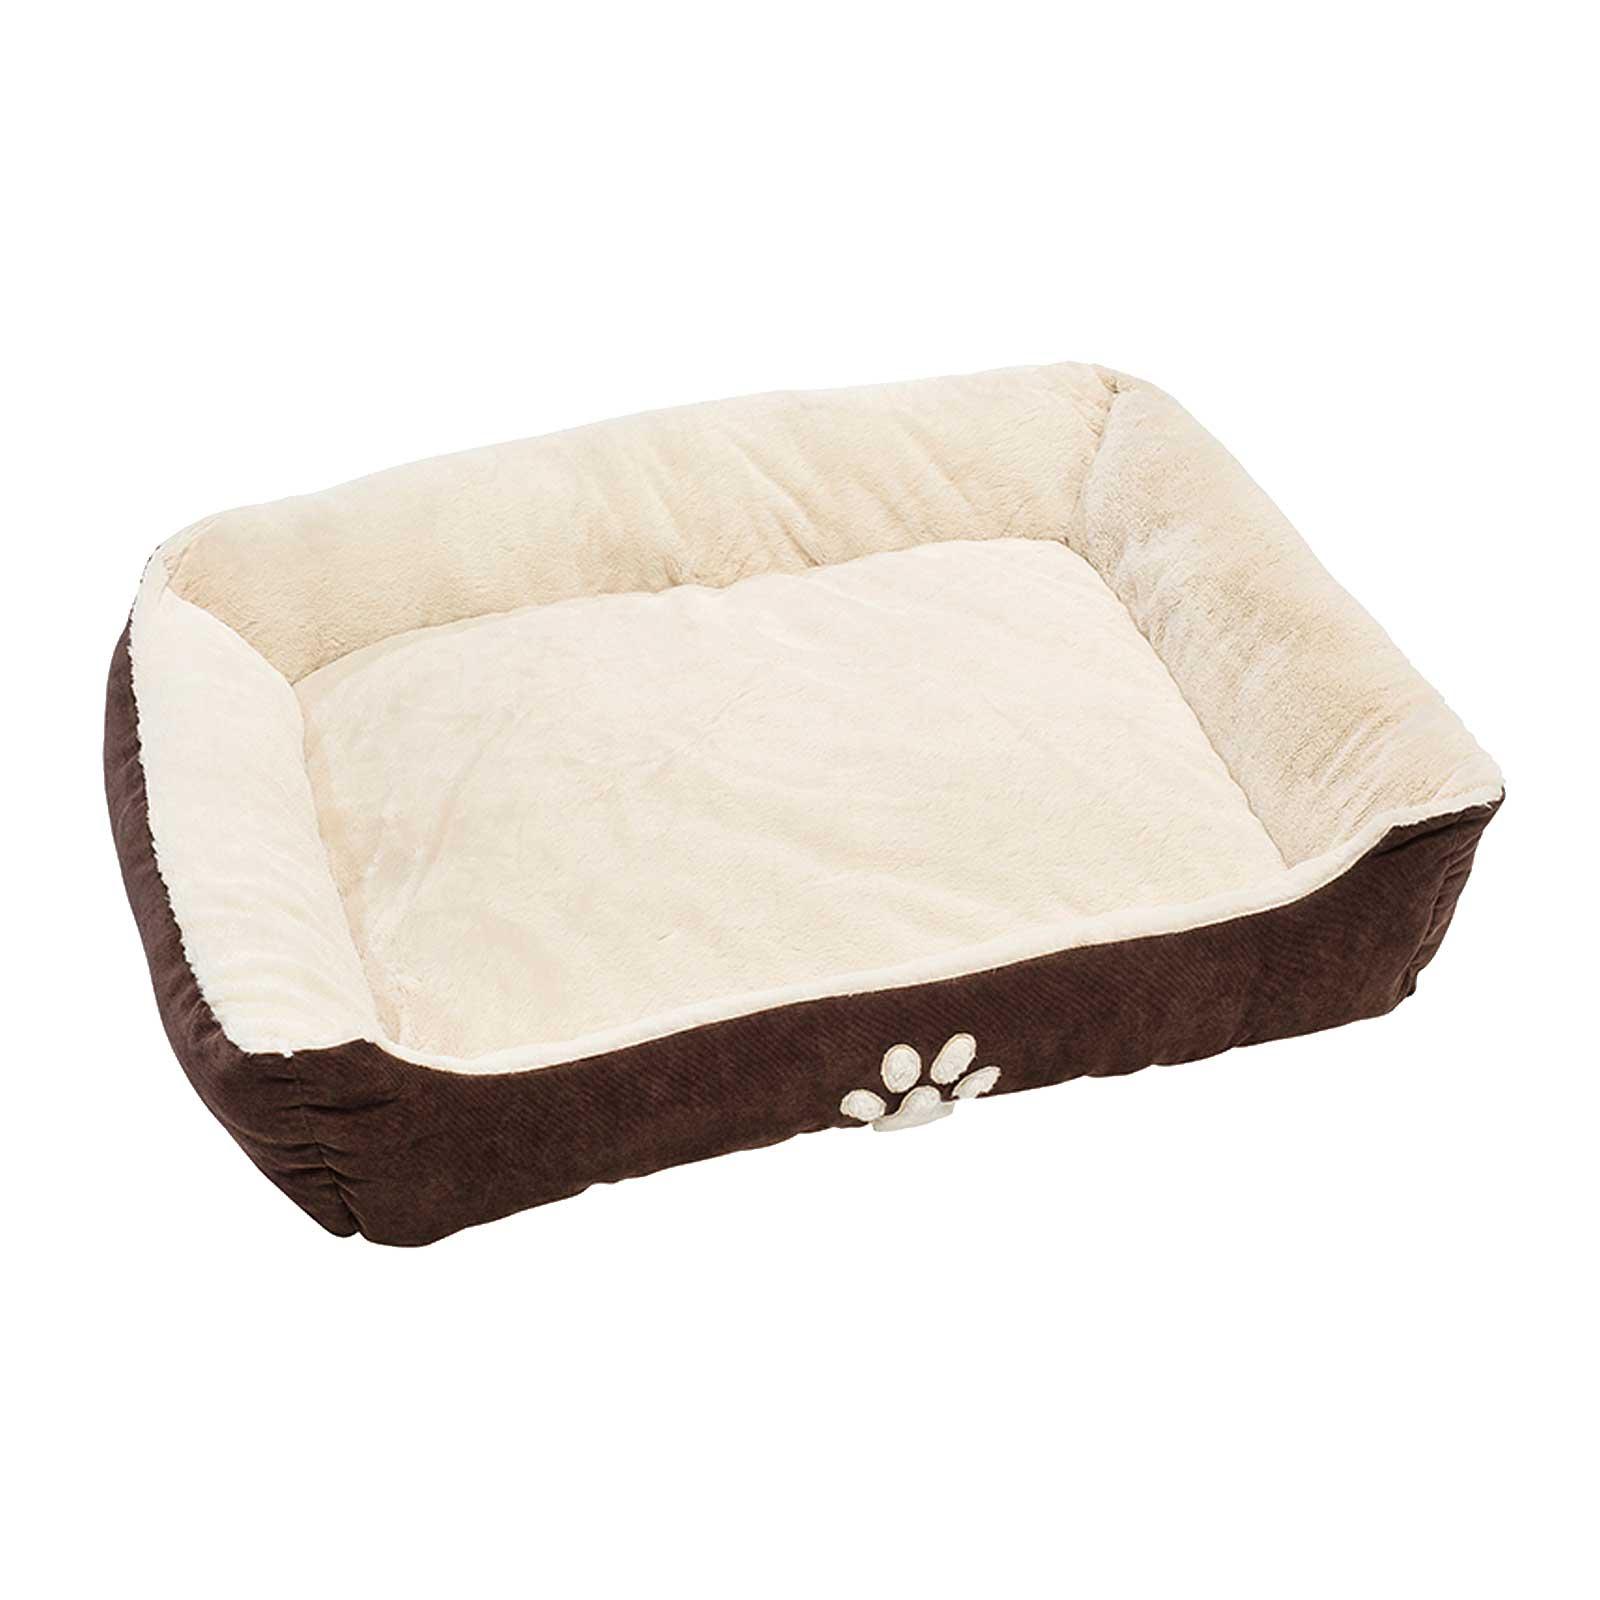 Hunde Luxus Kissen Hundebett 90 x 70 x 20 cm, Braun